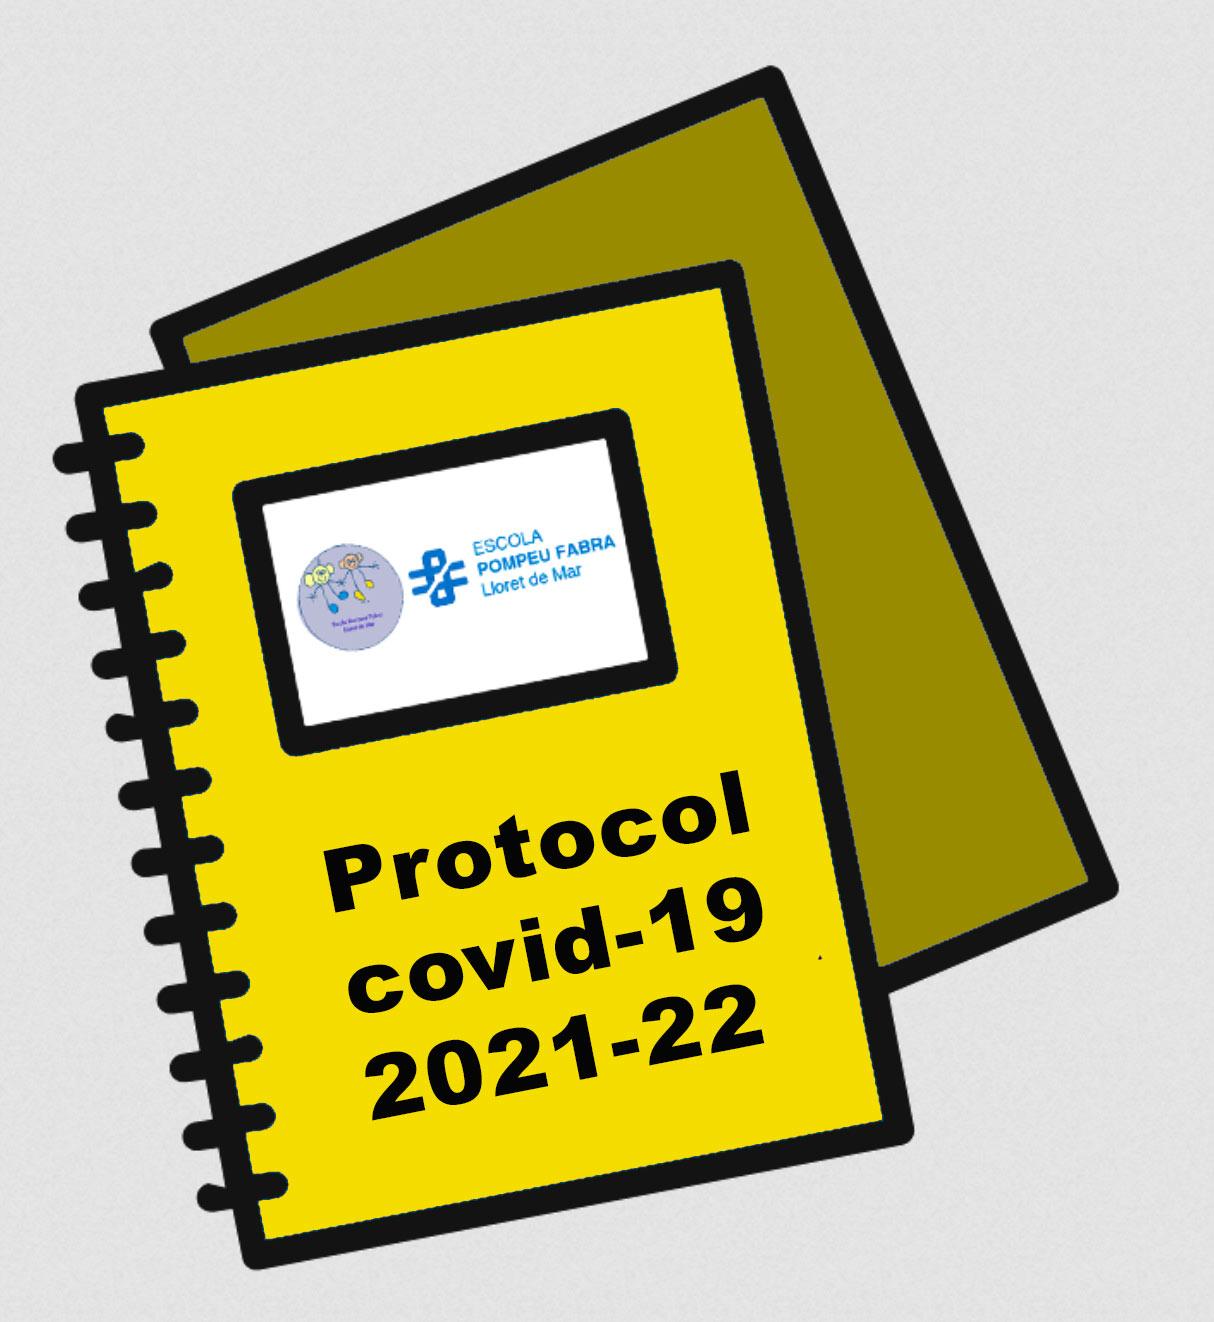 llibreta-covid-19